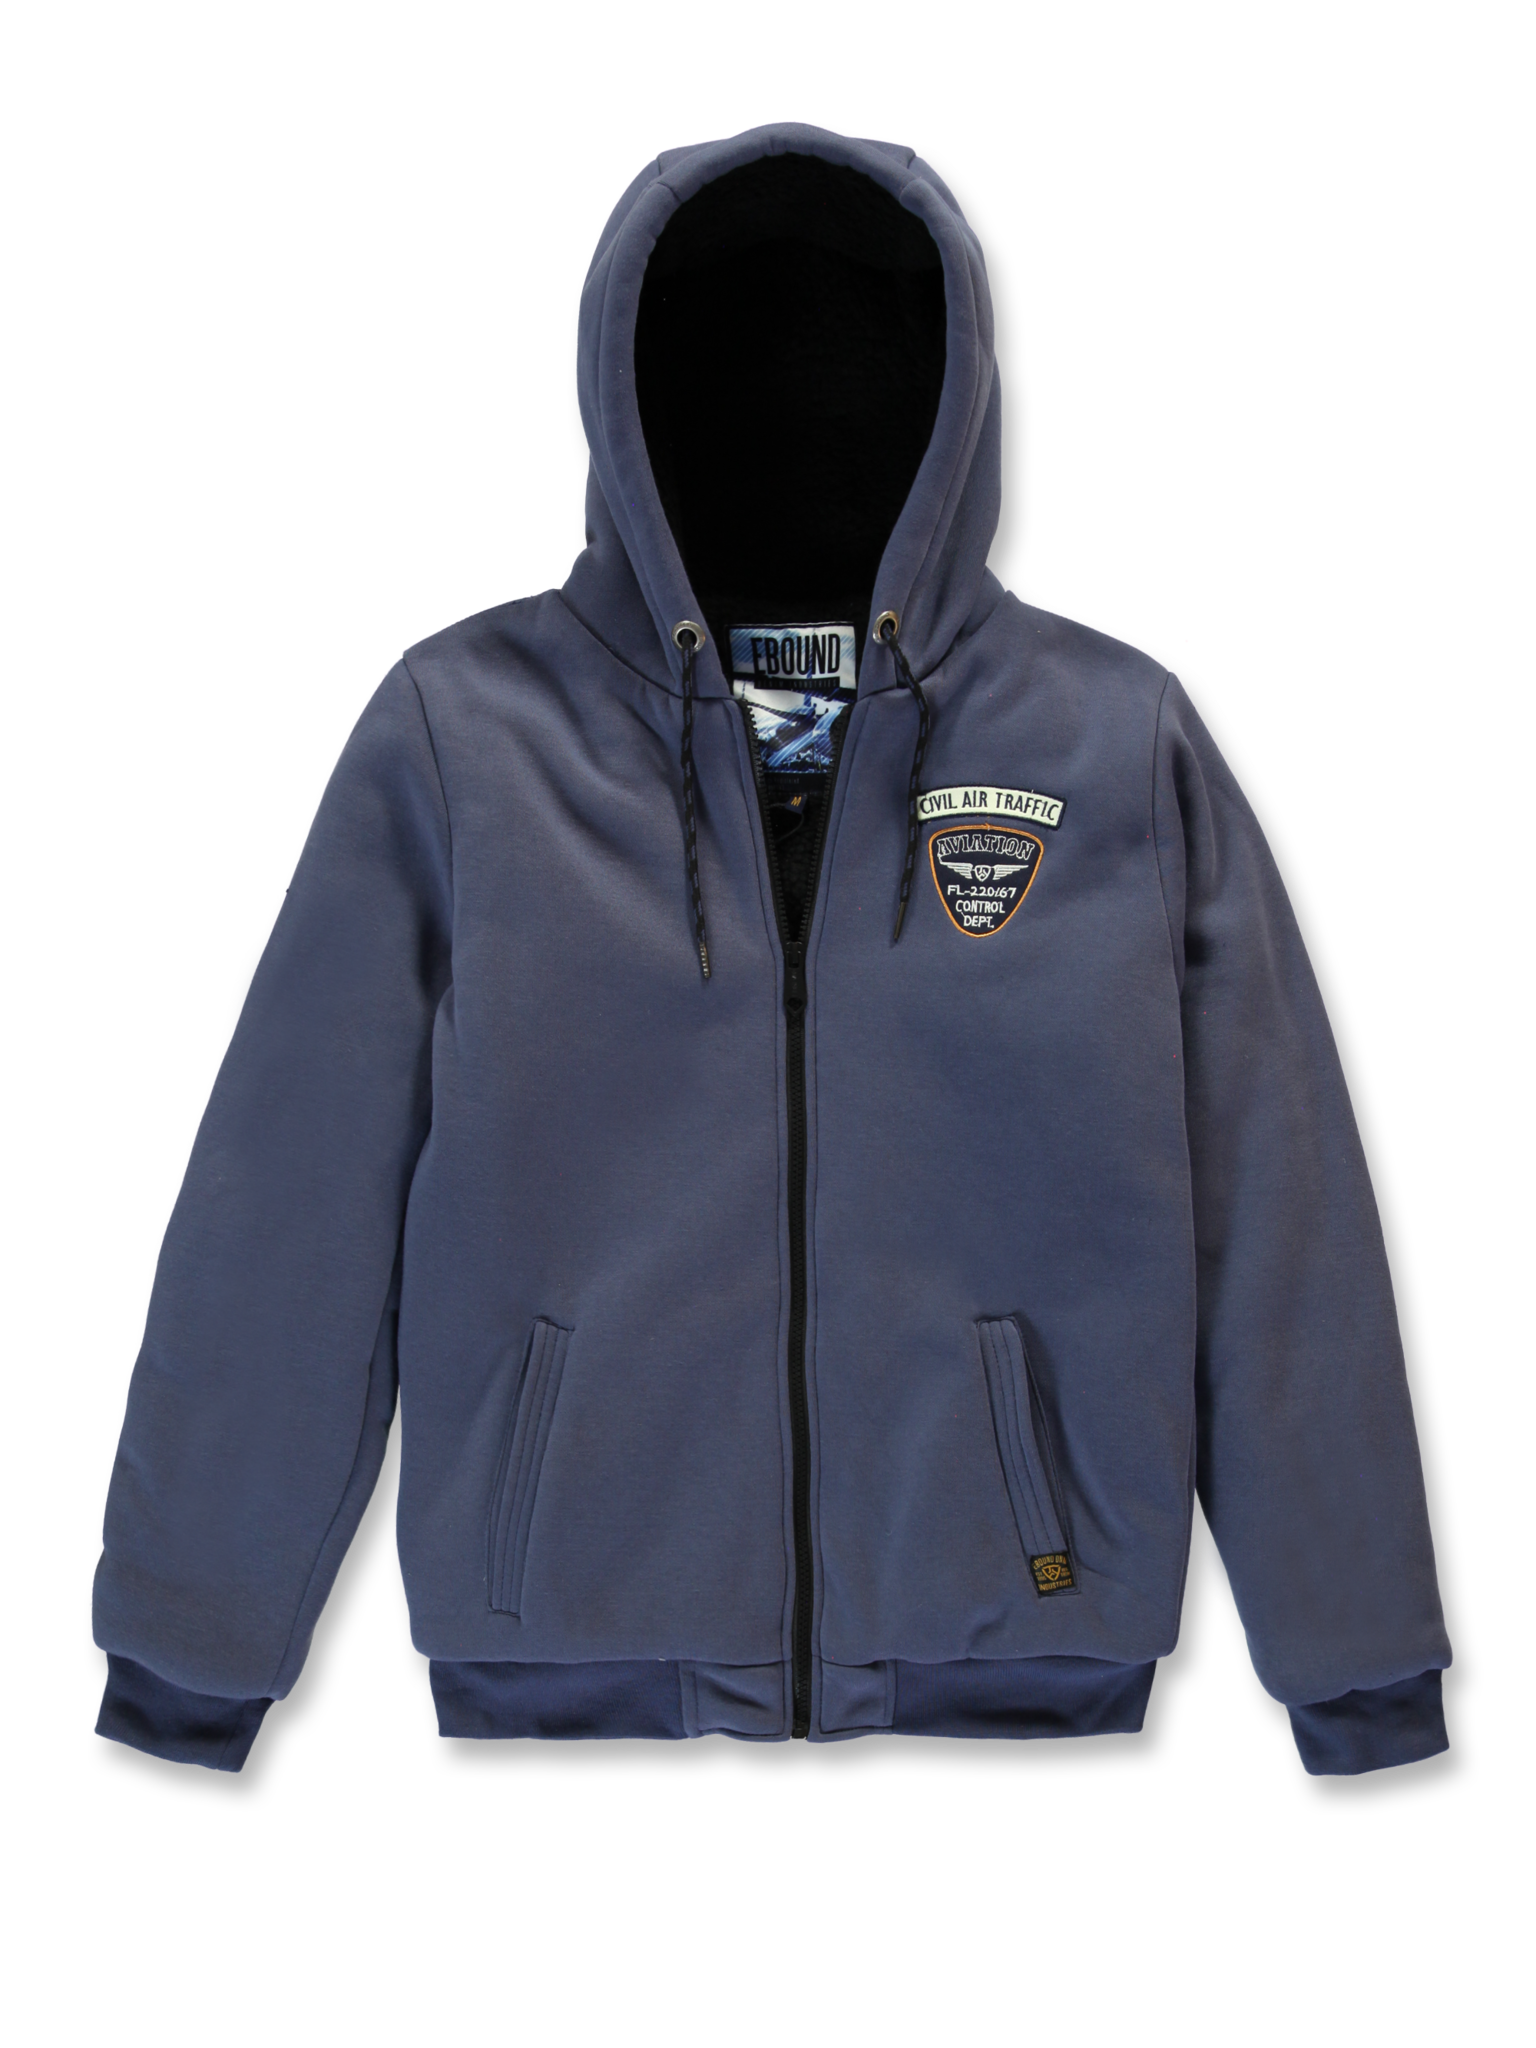 All Brands | Winterproducts Men | Cardigan Sweater | 18 pcs/box